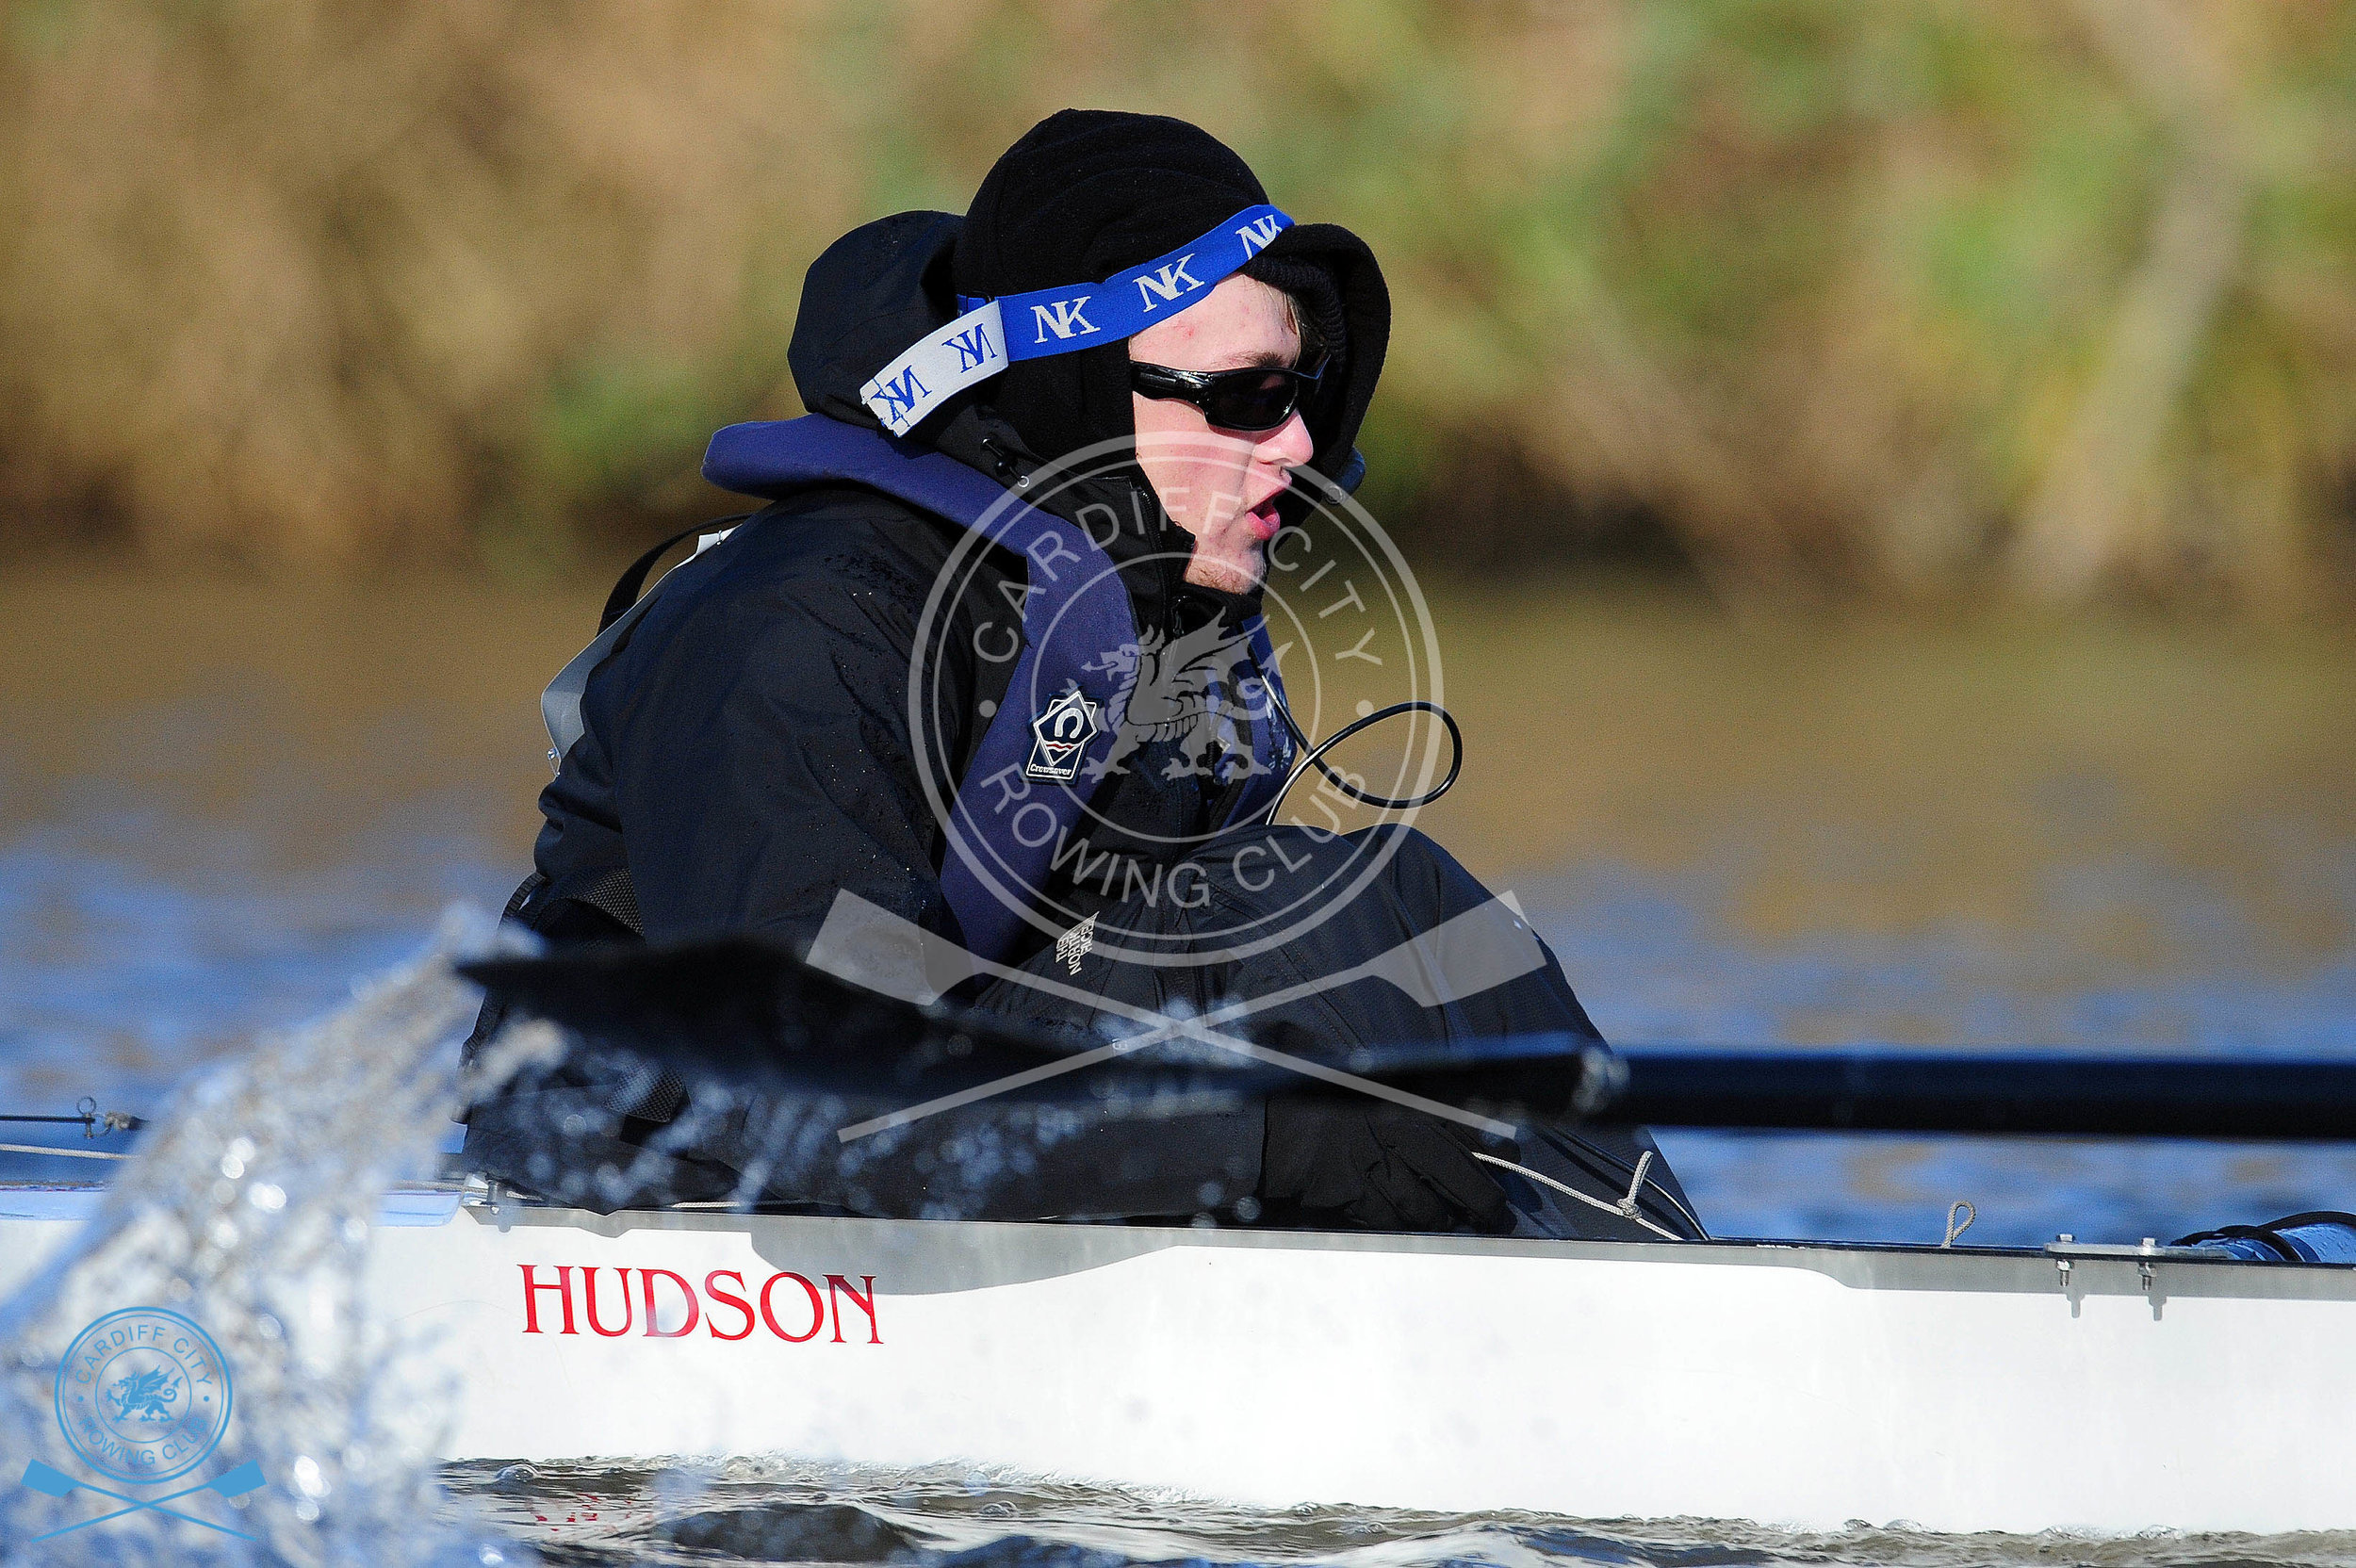 DW_280119_Cardiff_City_Rowing_239.jpg